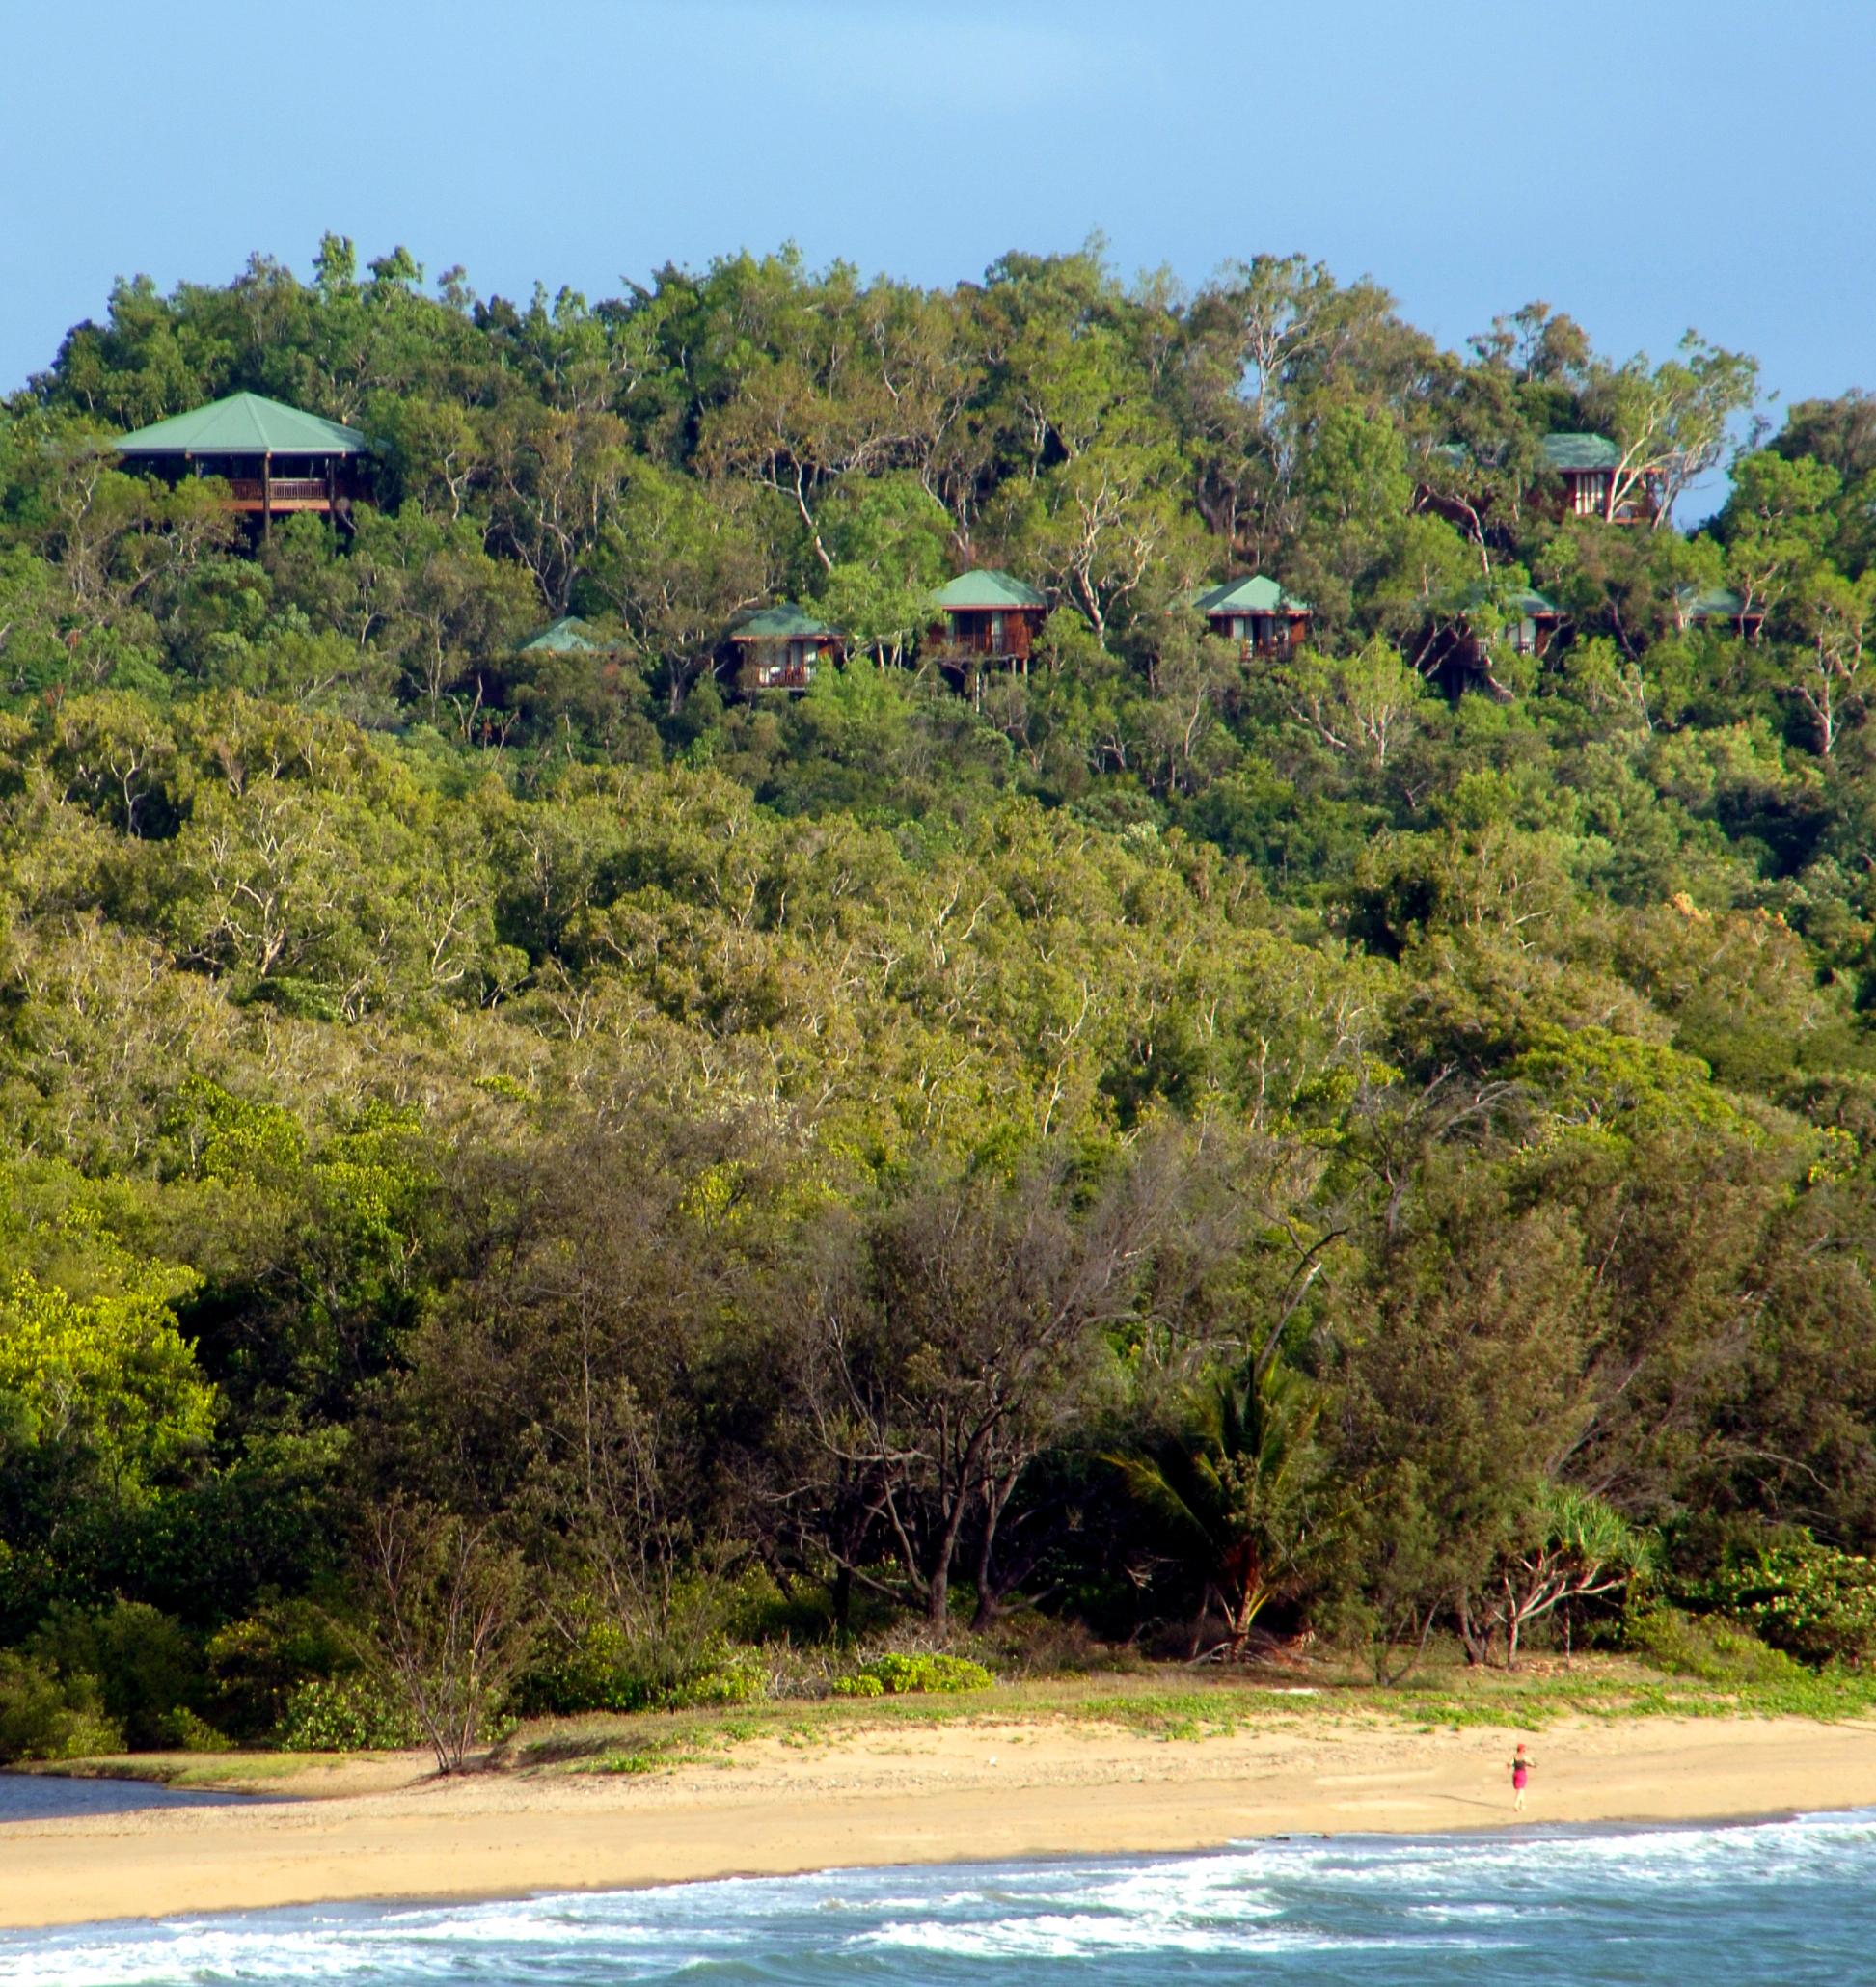 https://www.thalabeach.com.au/wp-content/uploads/2010/07/Thala_Beach_Lodge_0027.jpg